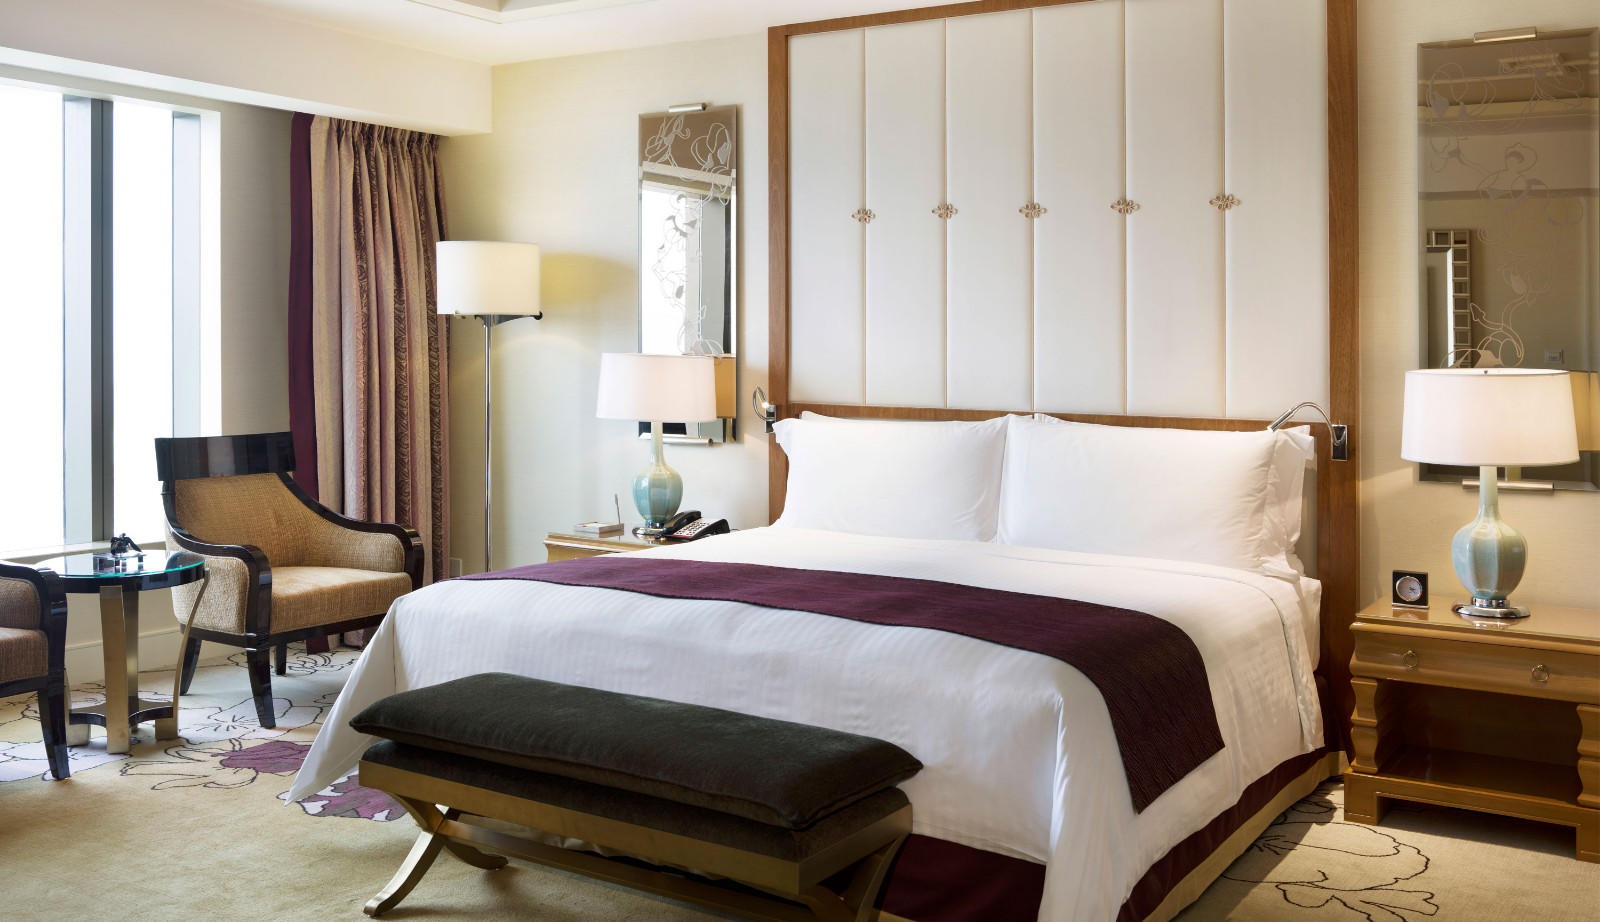 YSK Furniture commercial hotel bar furniture suite for furnishings-1